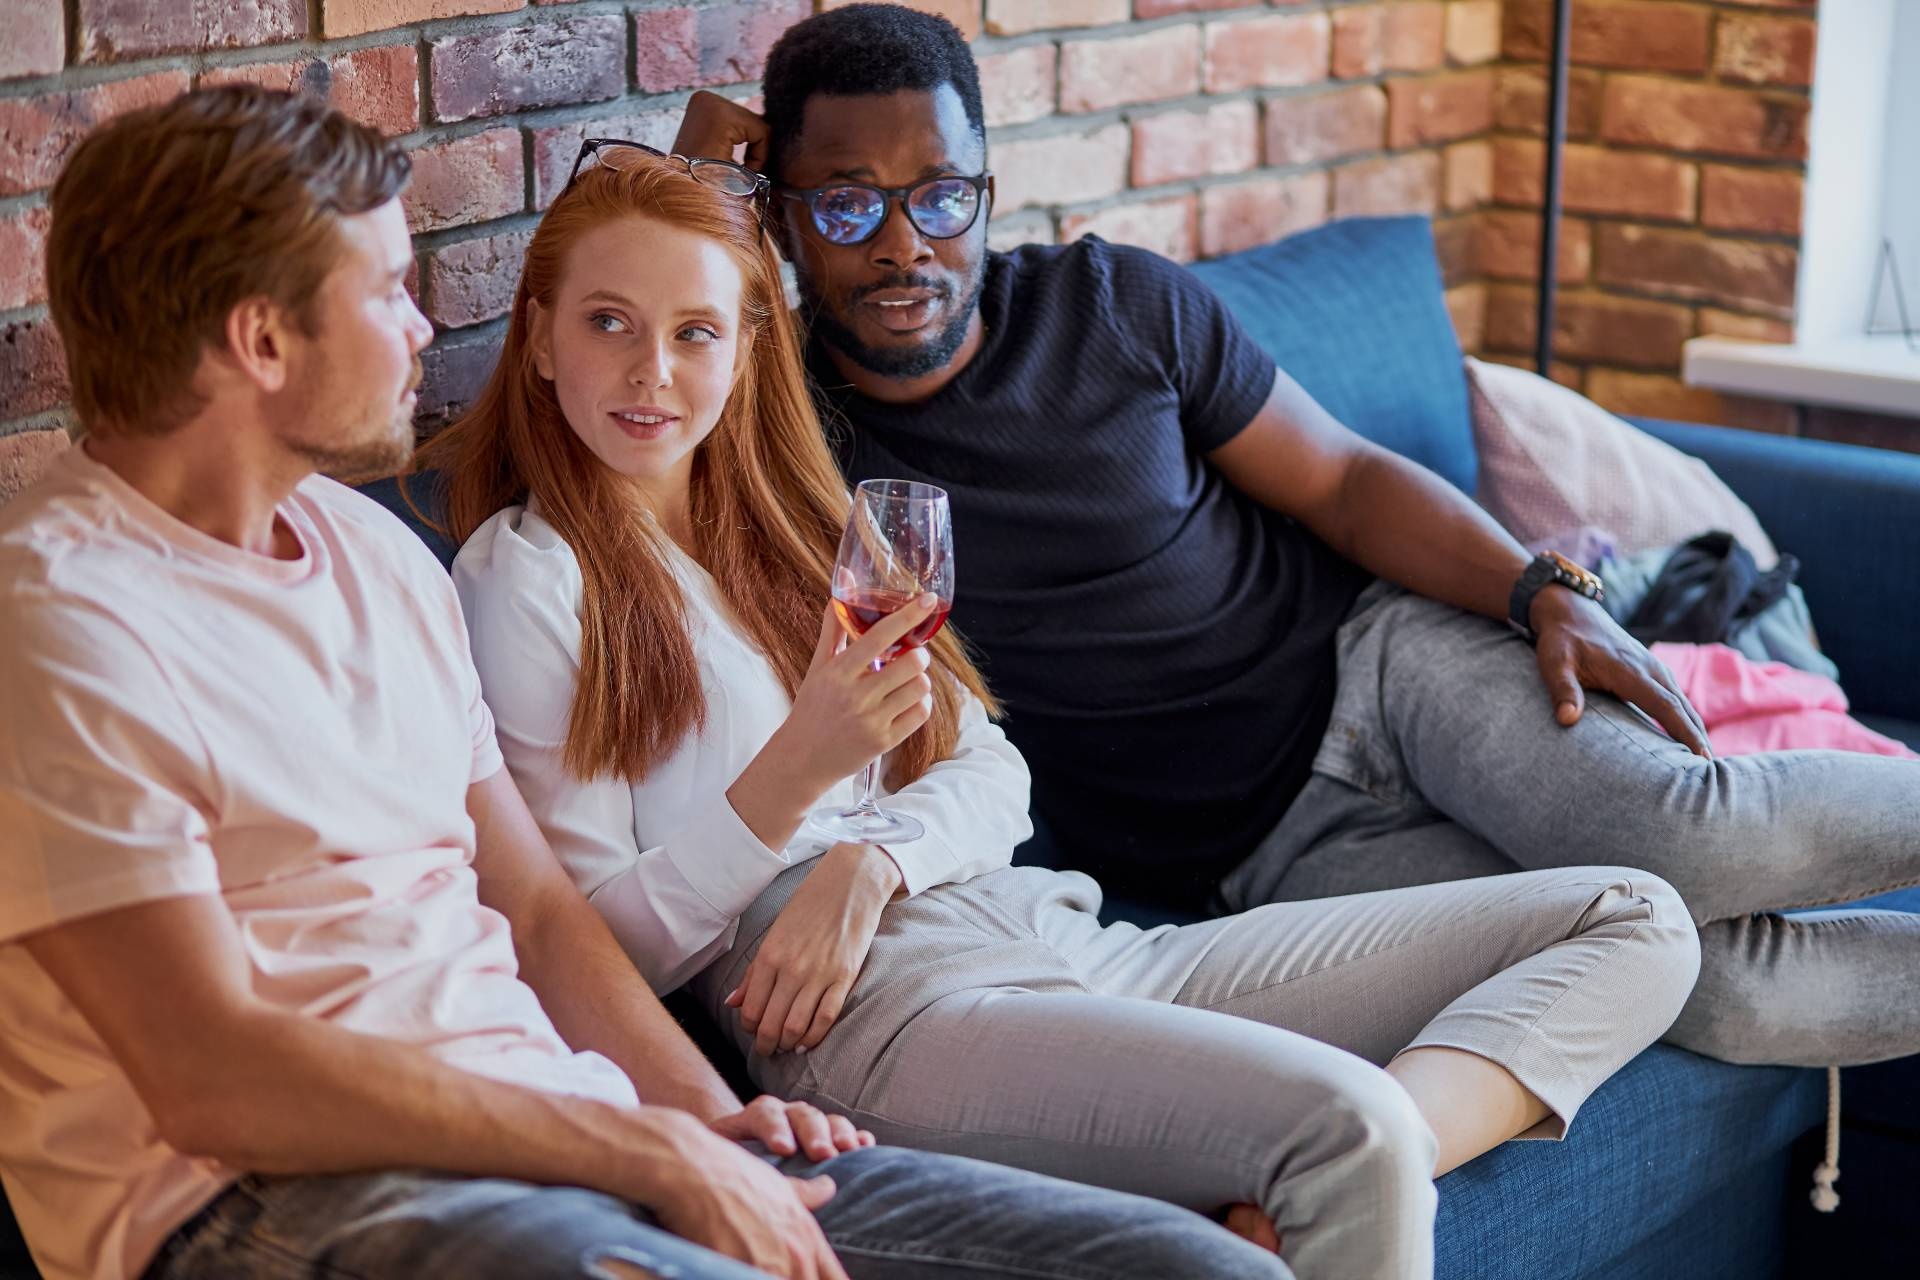 New Interview: Let's Talk About Non-Monogamous Relationships